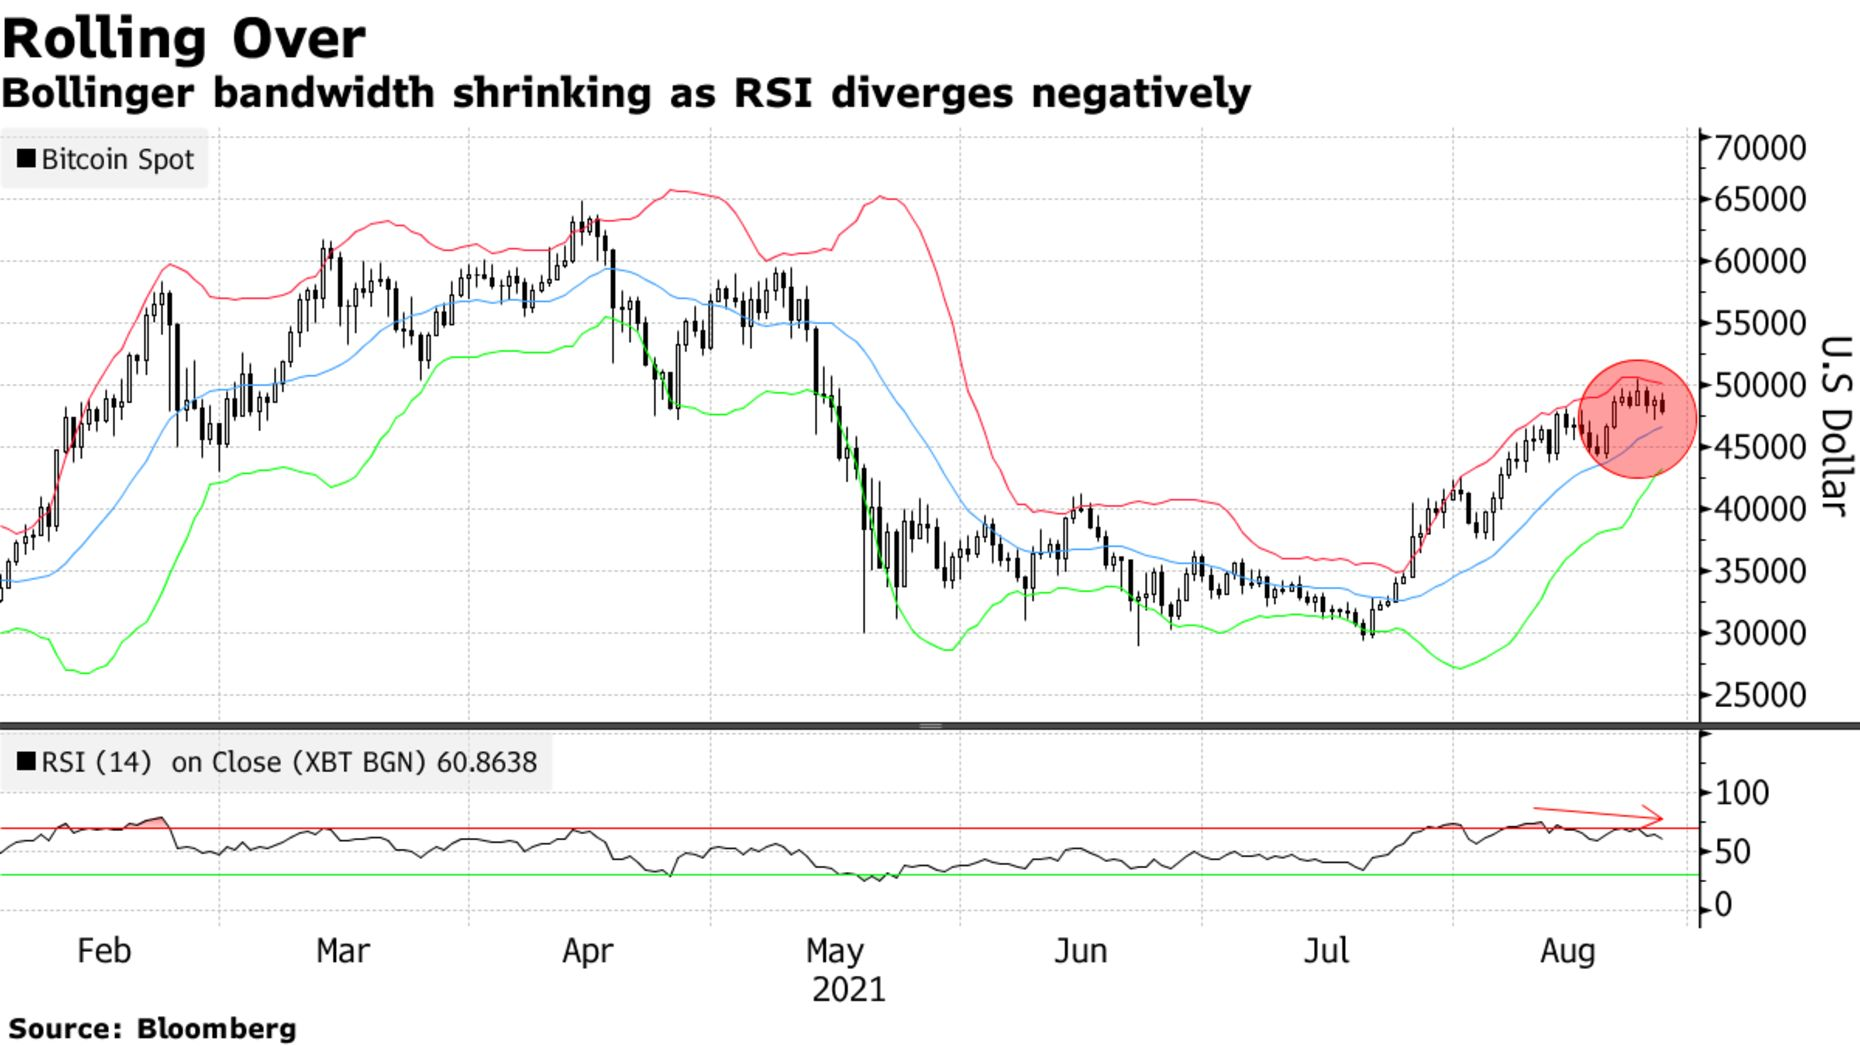 Bollinger bandwidth shrinking as RSI diverges negatively